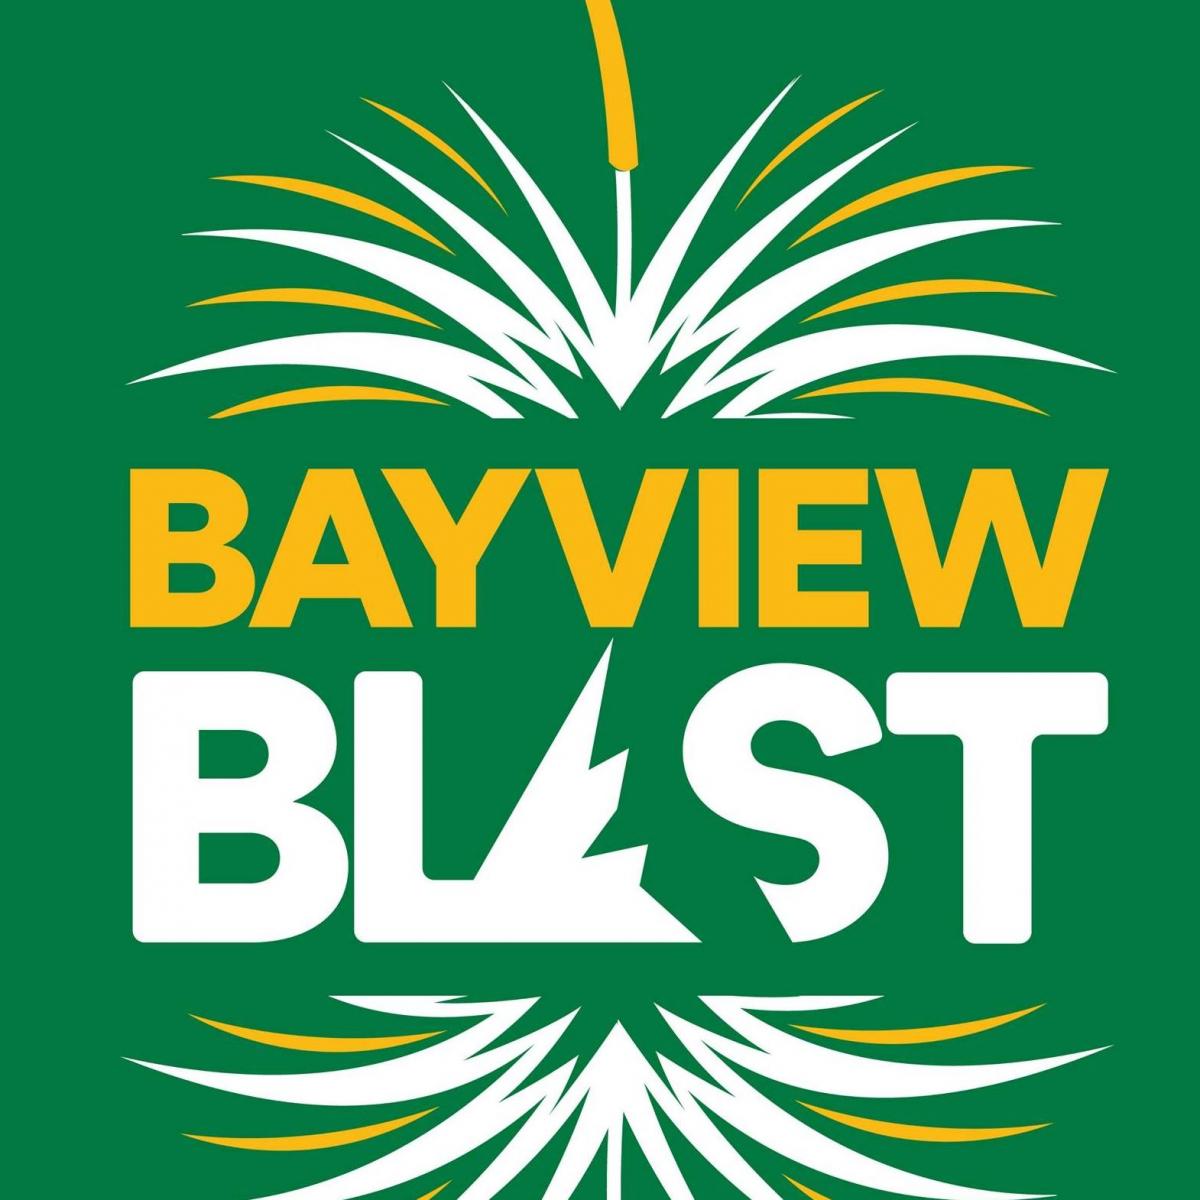 2021 Bayview Blast